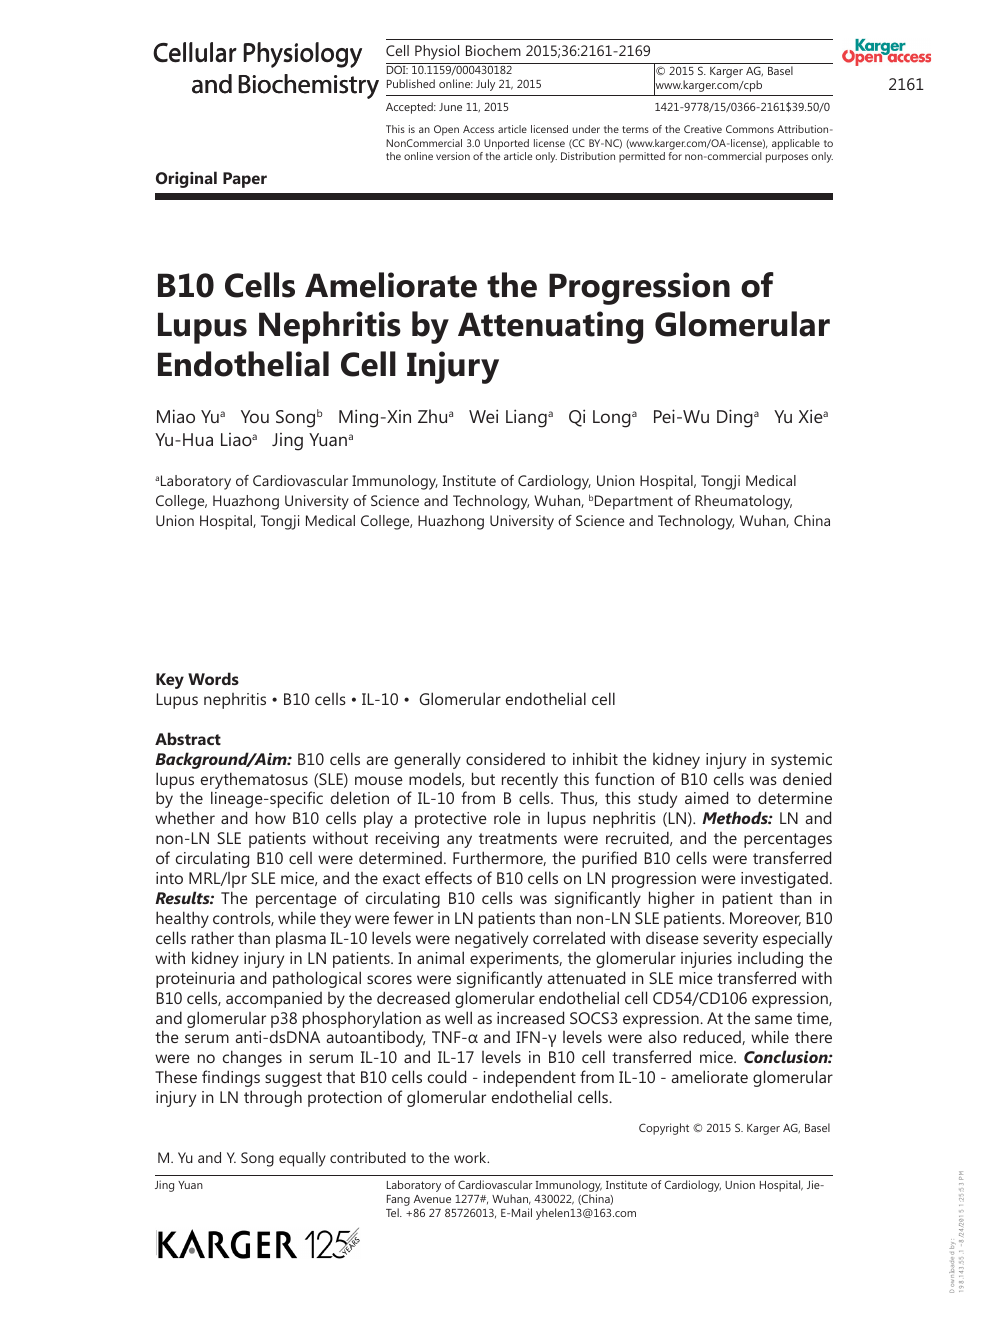 foto de B10 Cells Ameliorate the Progression of Lupus Nephritis by ...